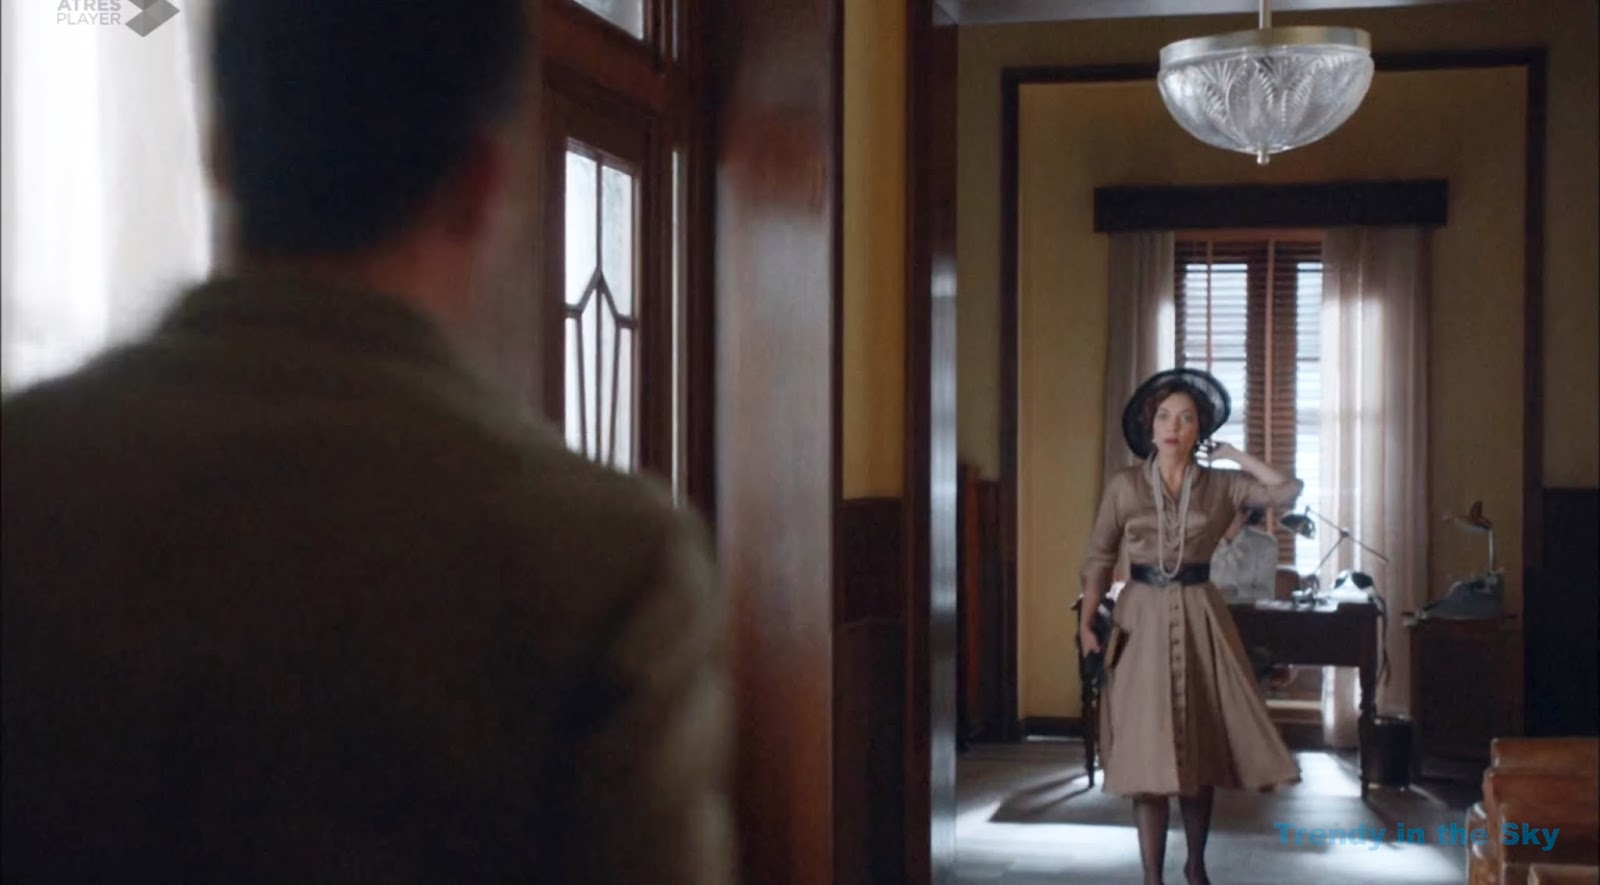 Galerías Velvet Pilar vestido marrón. Capítulo 1